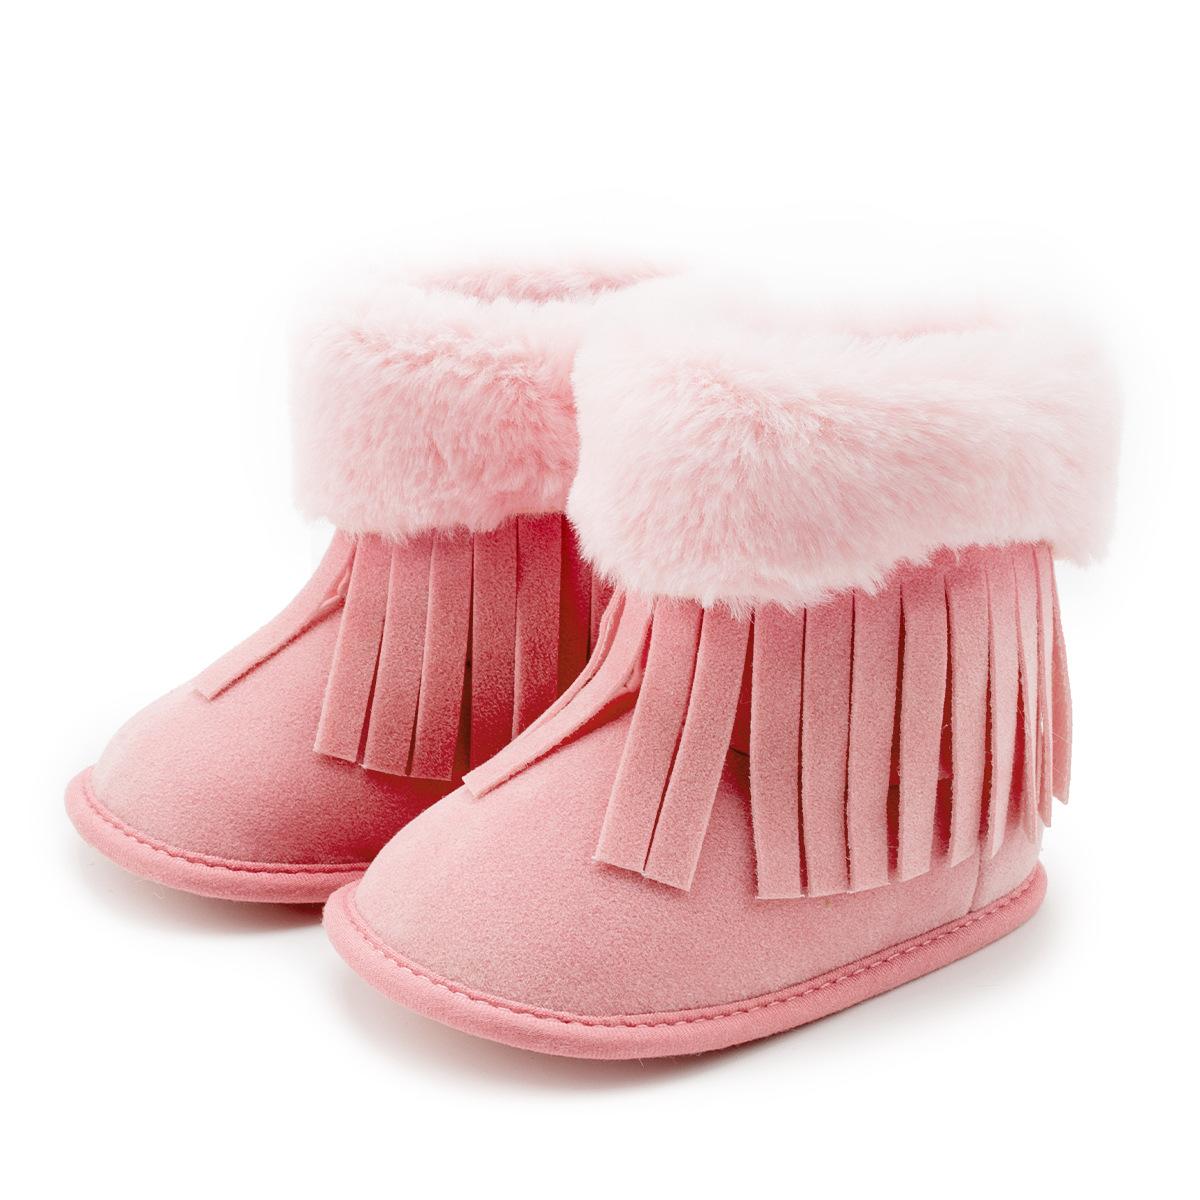 wholesale soft bottom newborn toddler shoes winter boy girl baby tassel boots